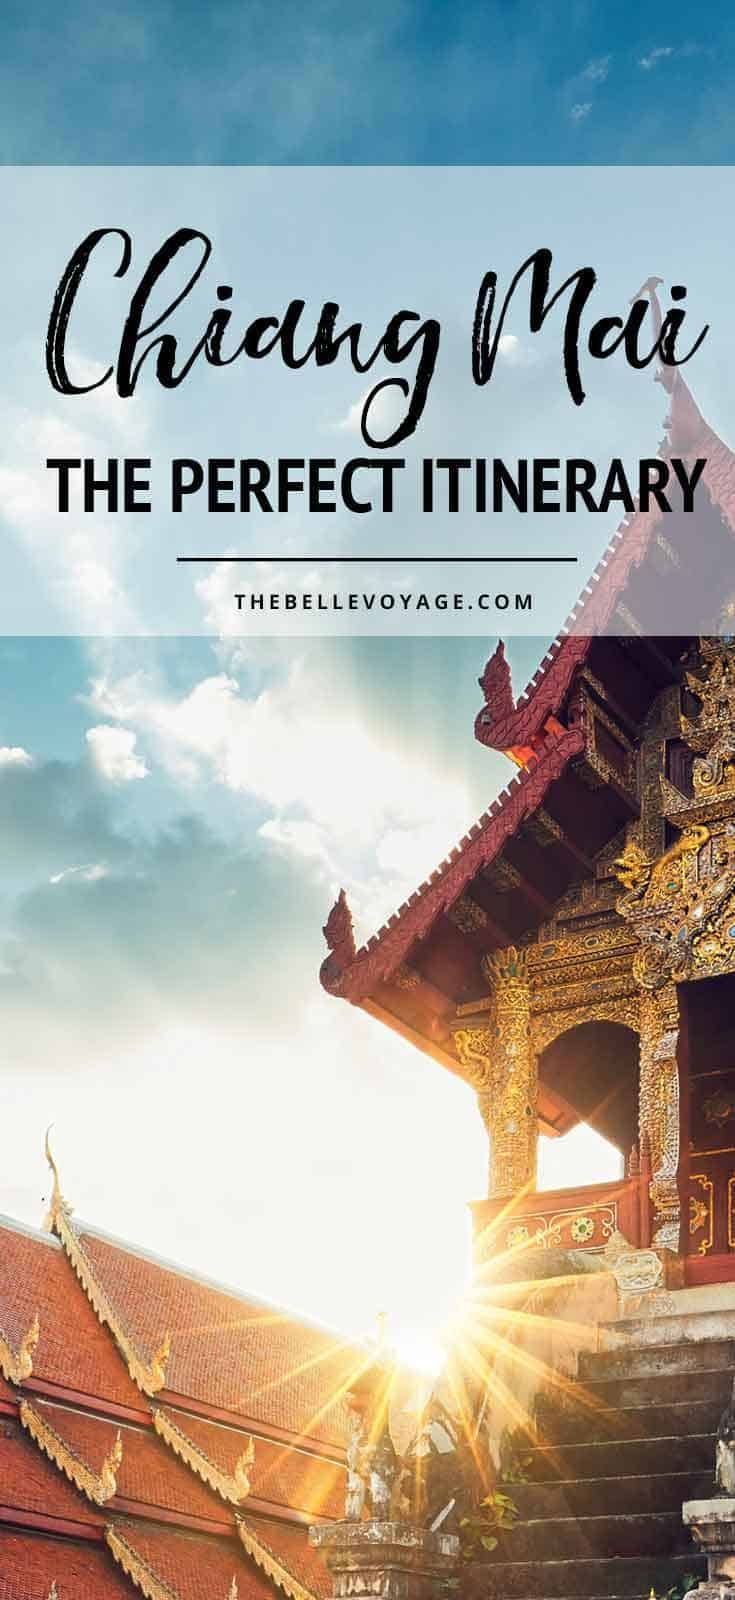 Chiang Mai Thailand | Things to Do in Chiang Mai | Chiang Mai Temples | Where to Stay in Chiang Mai | Chiang Mai Restaurants #chiangmai #thailand #travel